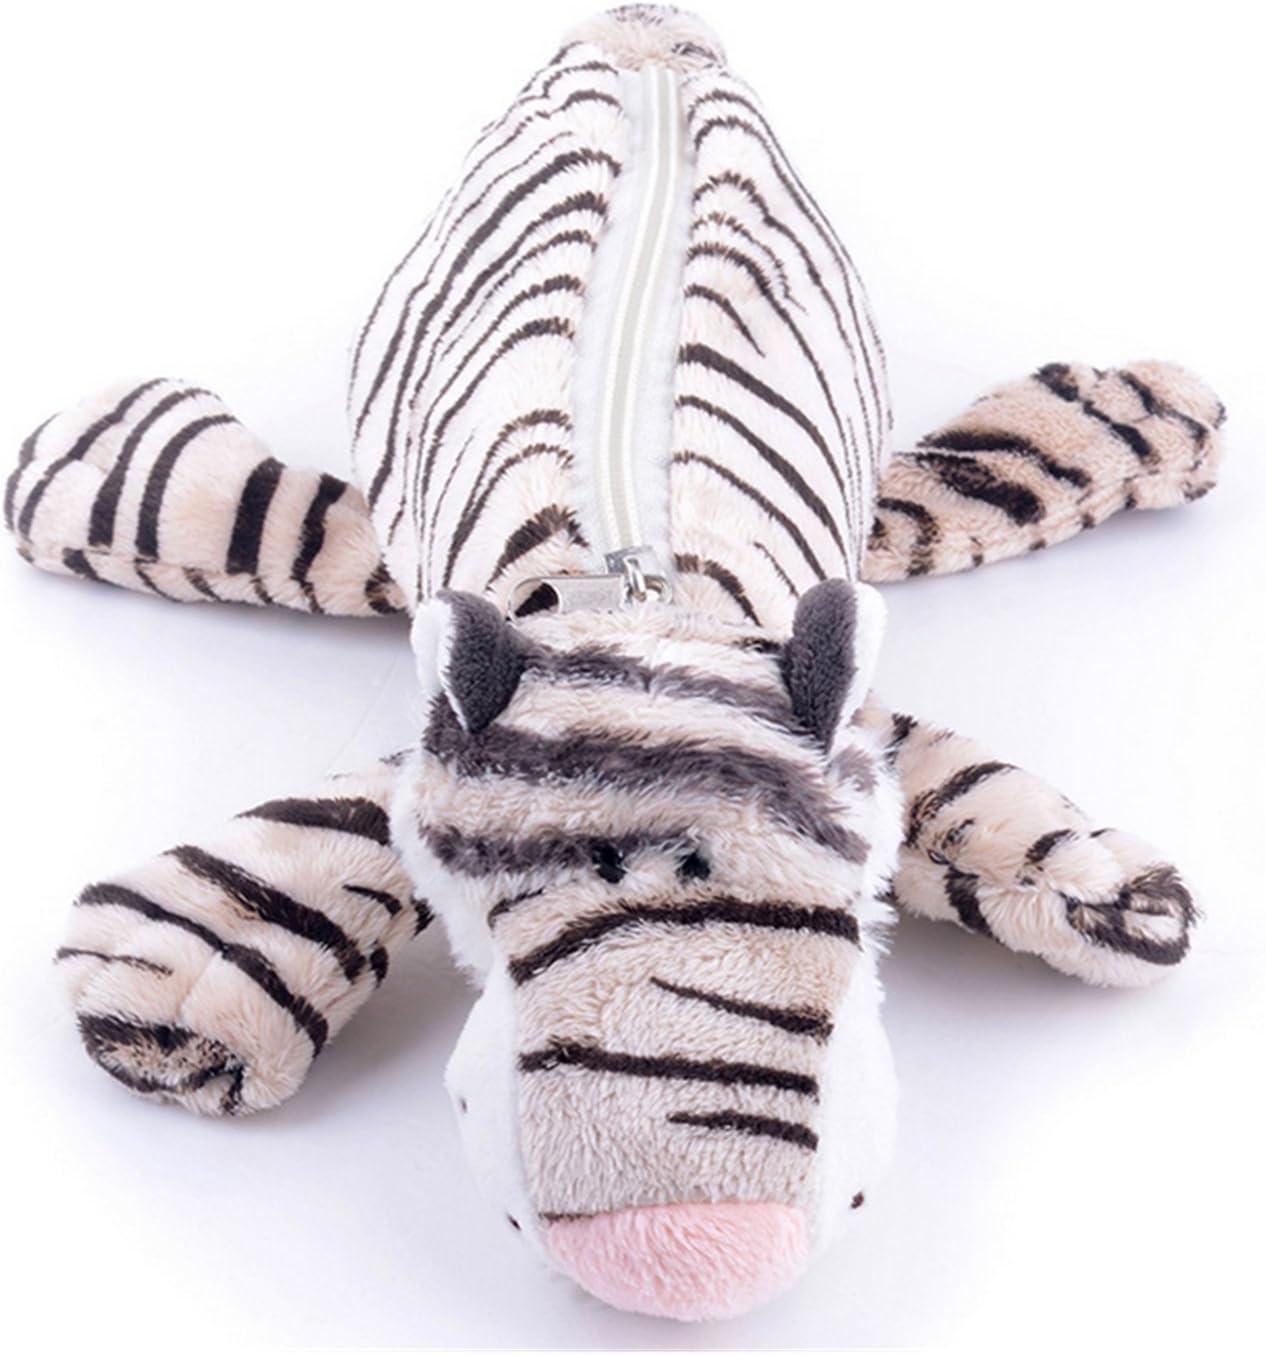 Students Cute Cartoon Animal Soft Plush Pencil-box Cafe Office Supplies Pen&pencil Holder Cases (White black tiger stripes)